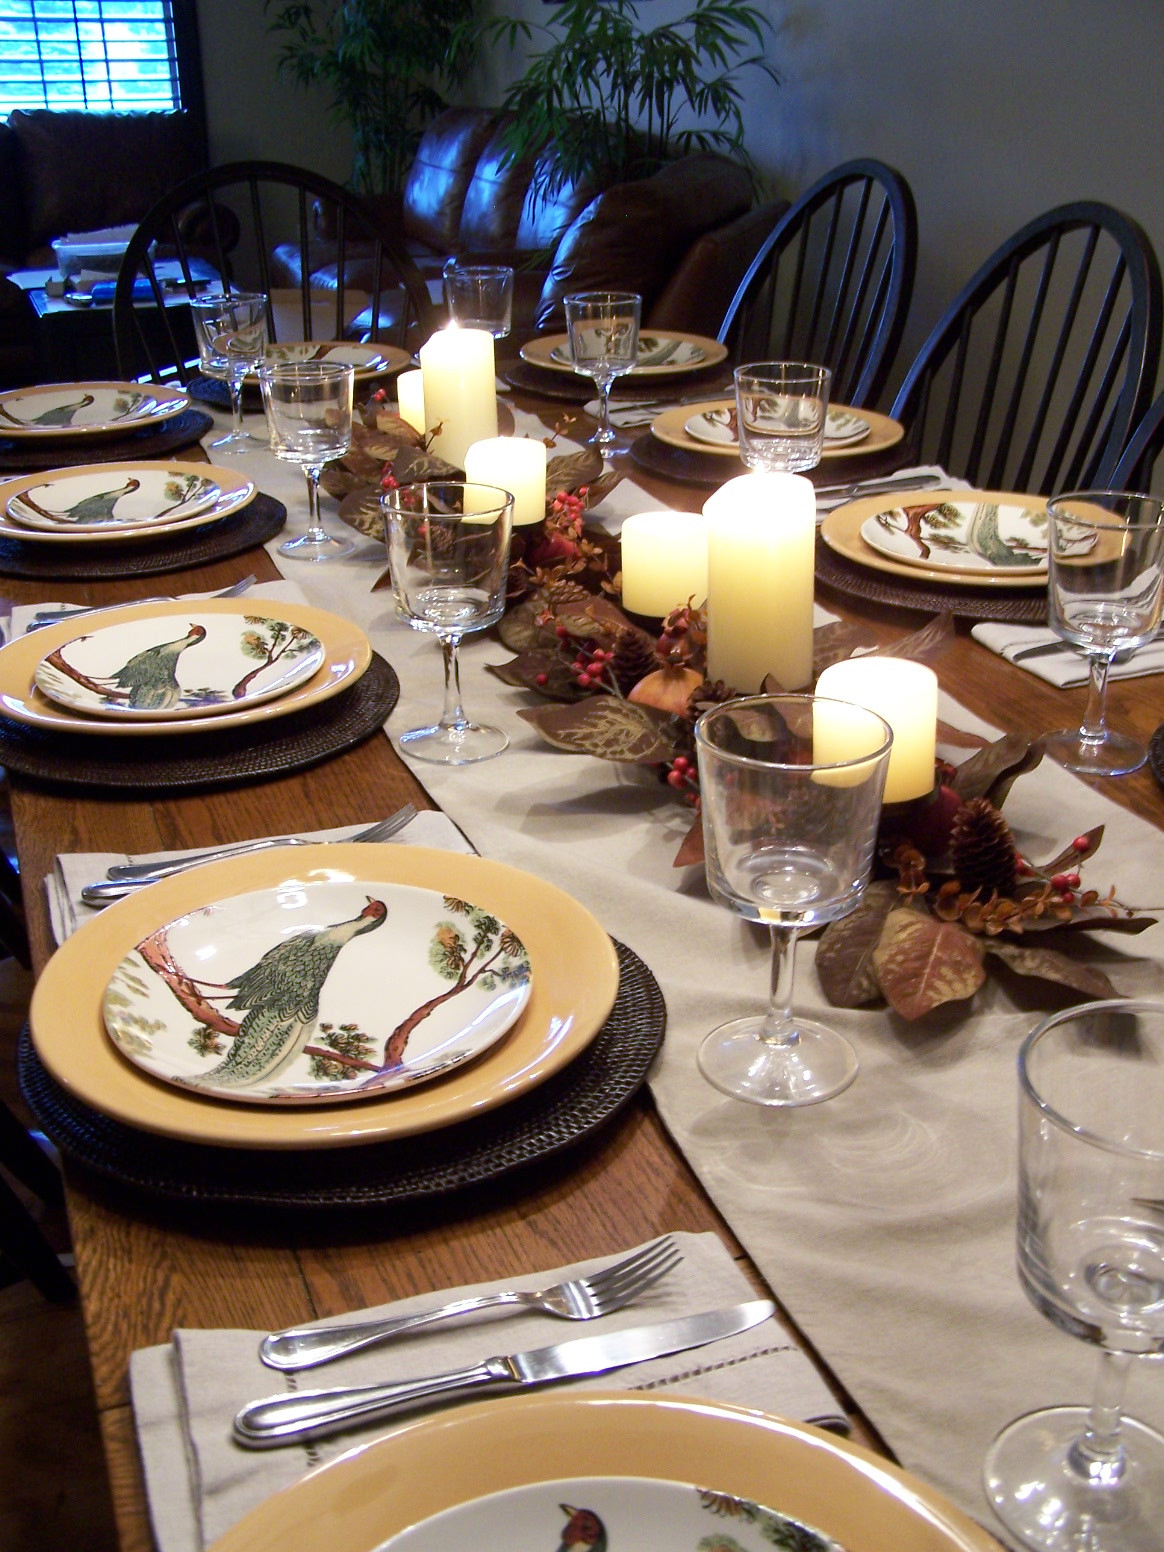 Thanksgiving Dinner Table  Allyson Jane Thanksgiving Dinner From Scratch